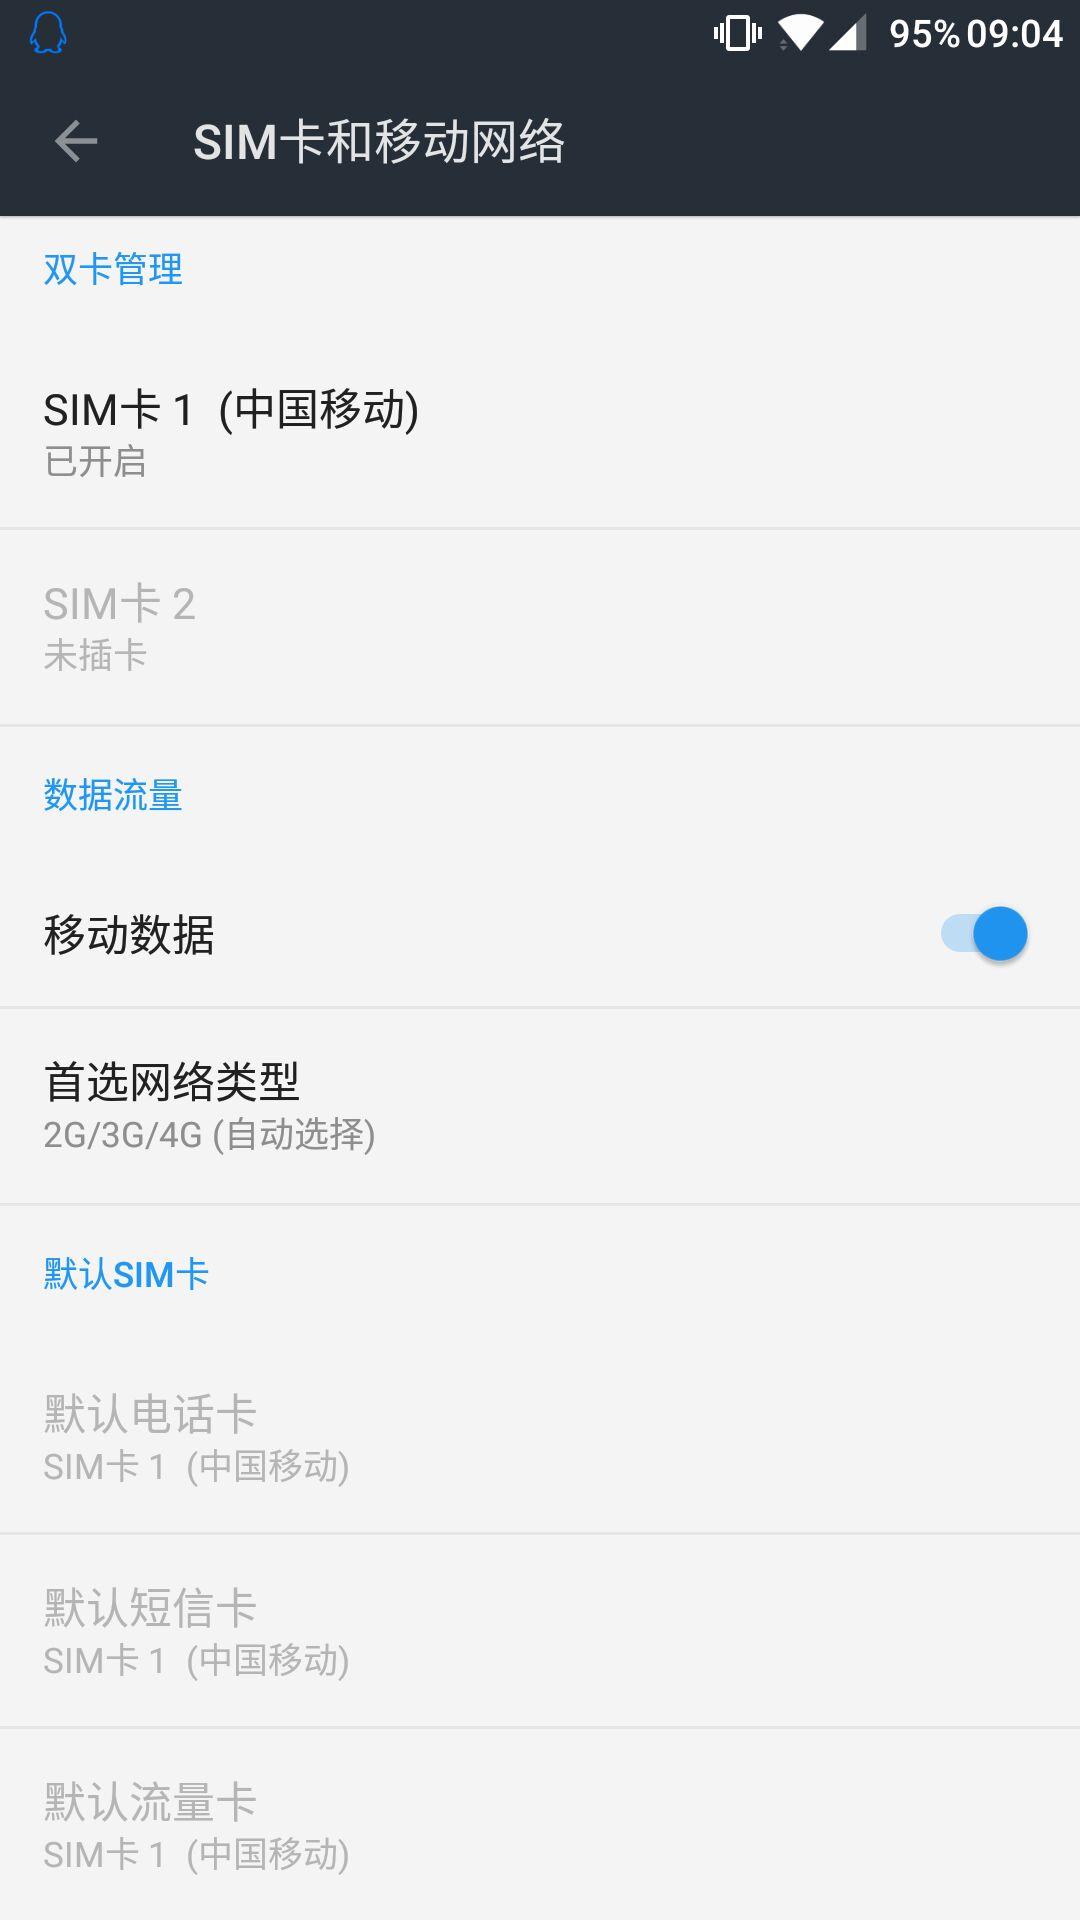 一加3刷机包 安卓Android 7.0来啦 H2OS For OnePlus 3公测版 全网首发 极致体验截图